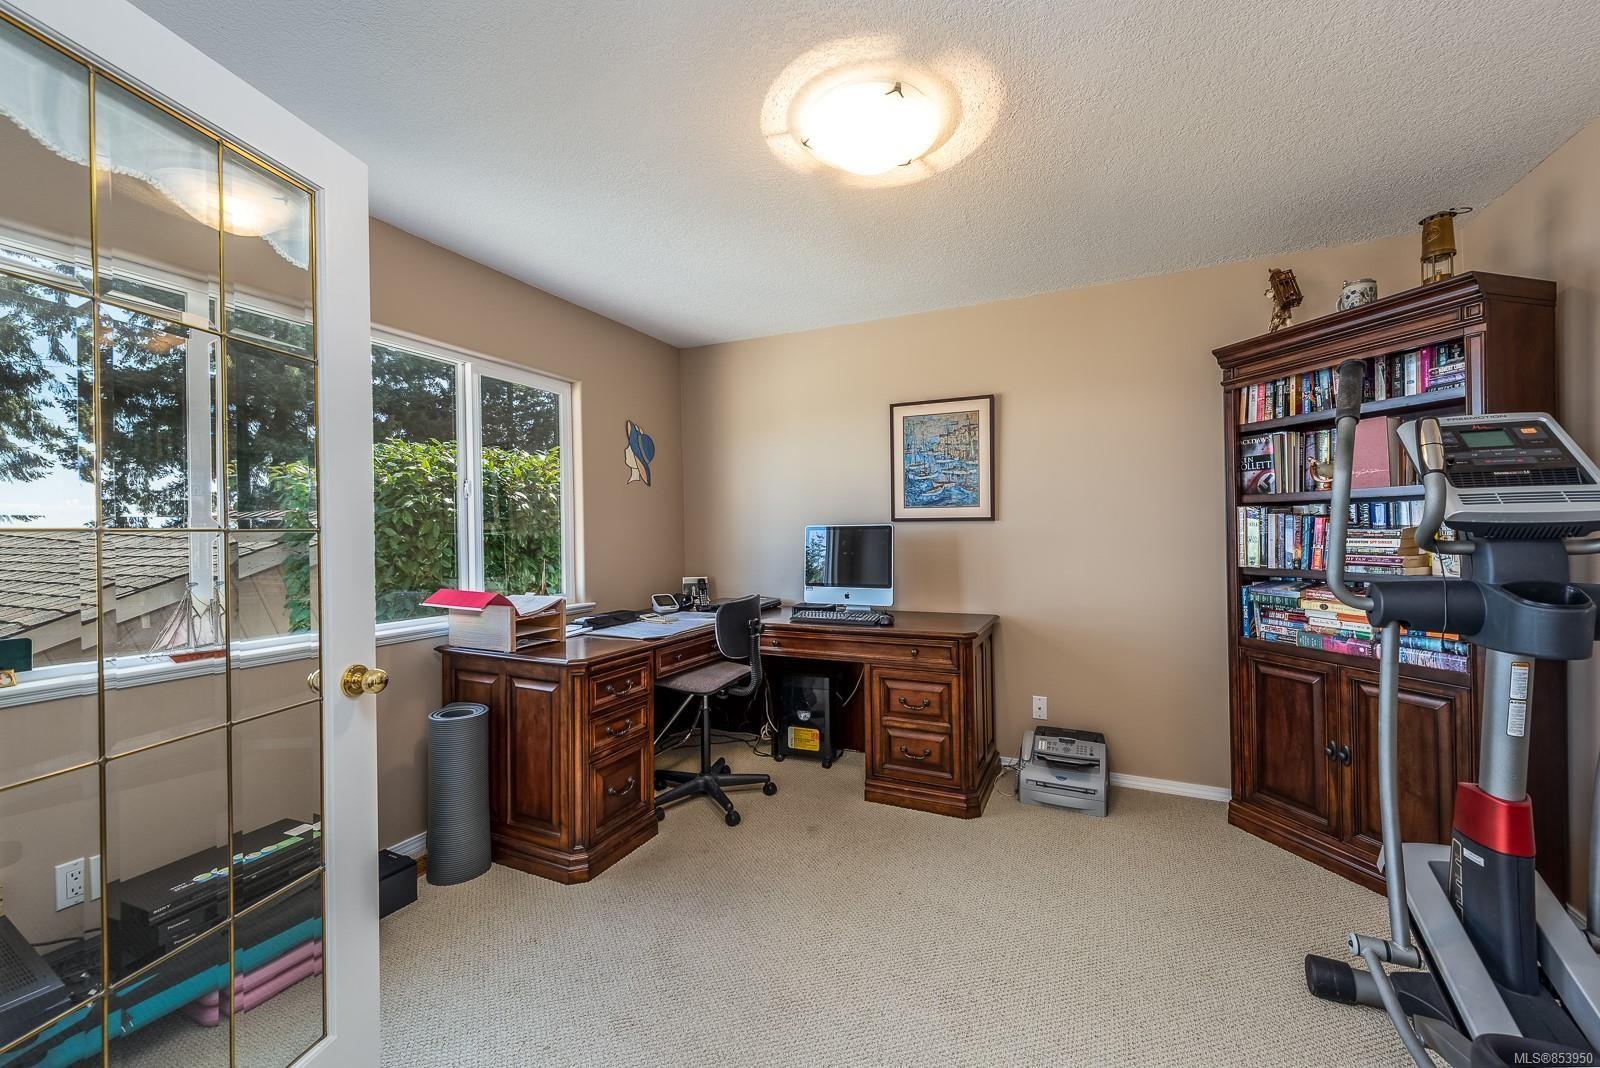 Photo 21: Photos: 5880 GARVIN Rd in : CV Union Bay/Fanny Bay House for sale (Comox Valley)  : MLS®# 853950